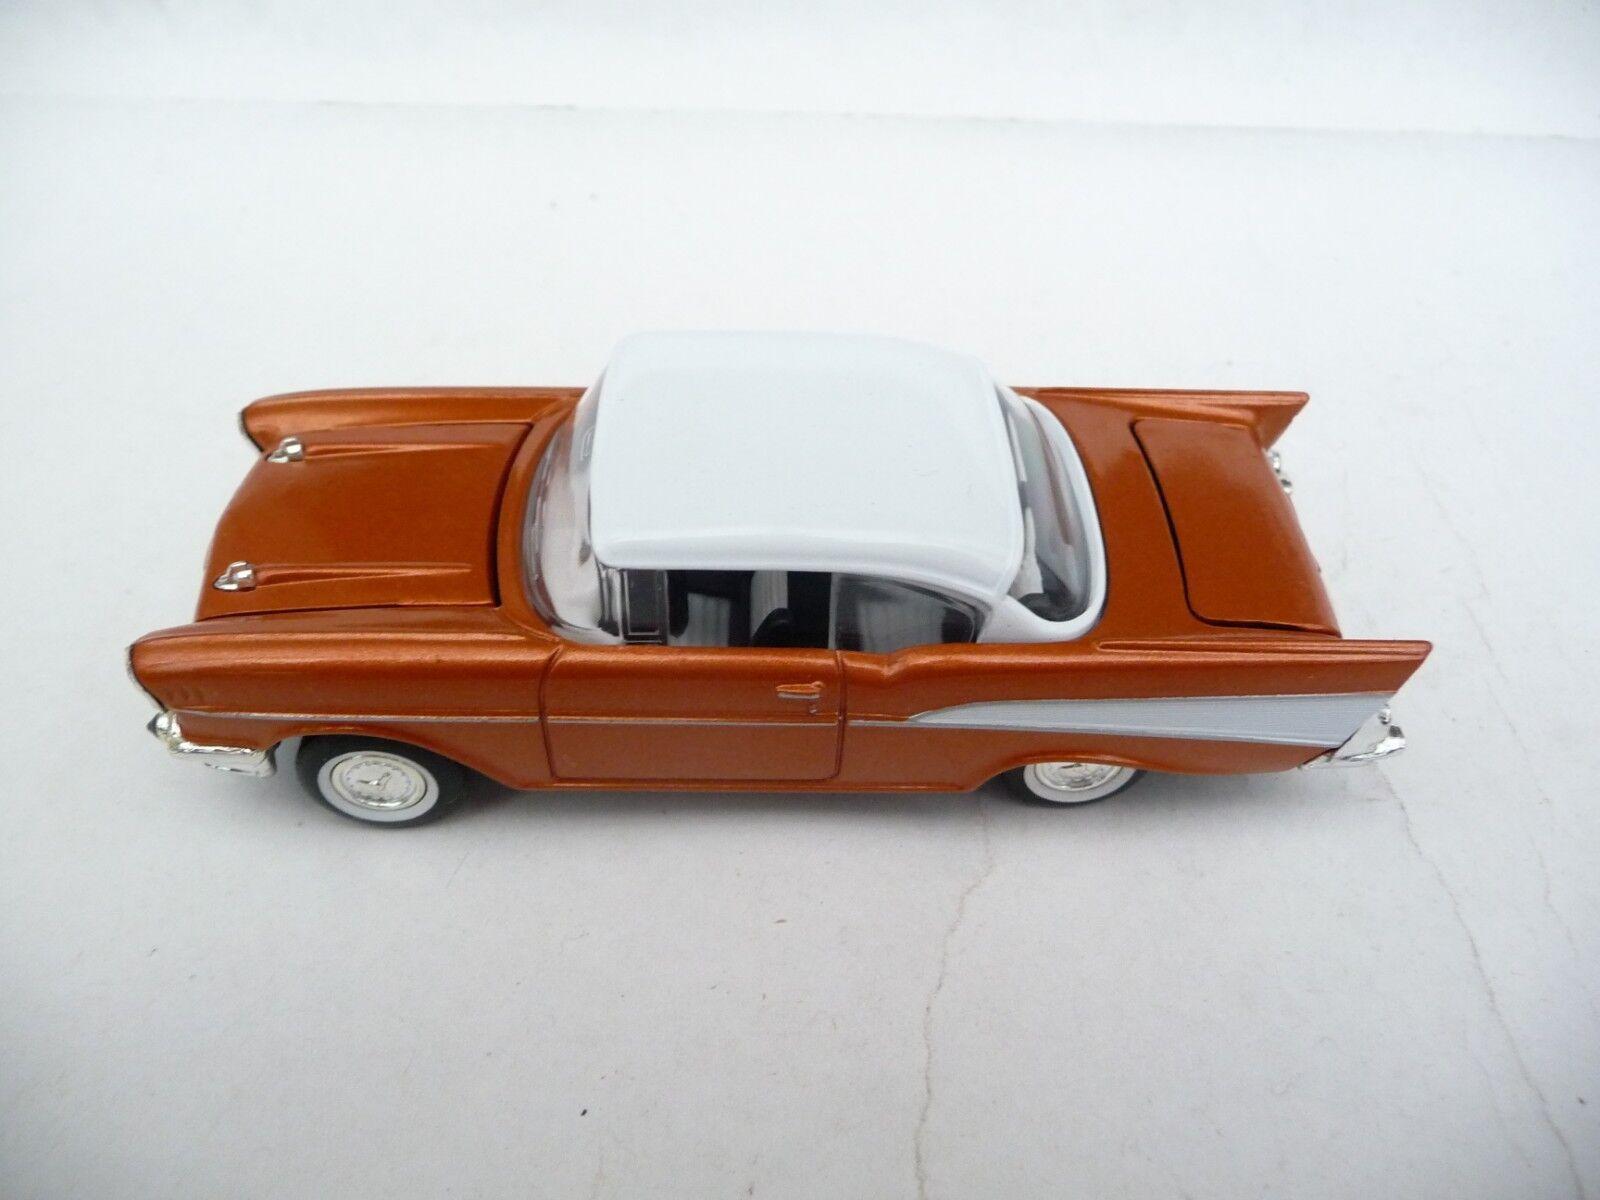 Corgi 1 43 chevrolet bel air 1957 50 millionstel chevy cc96570